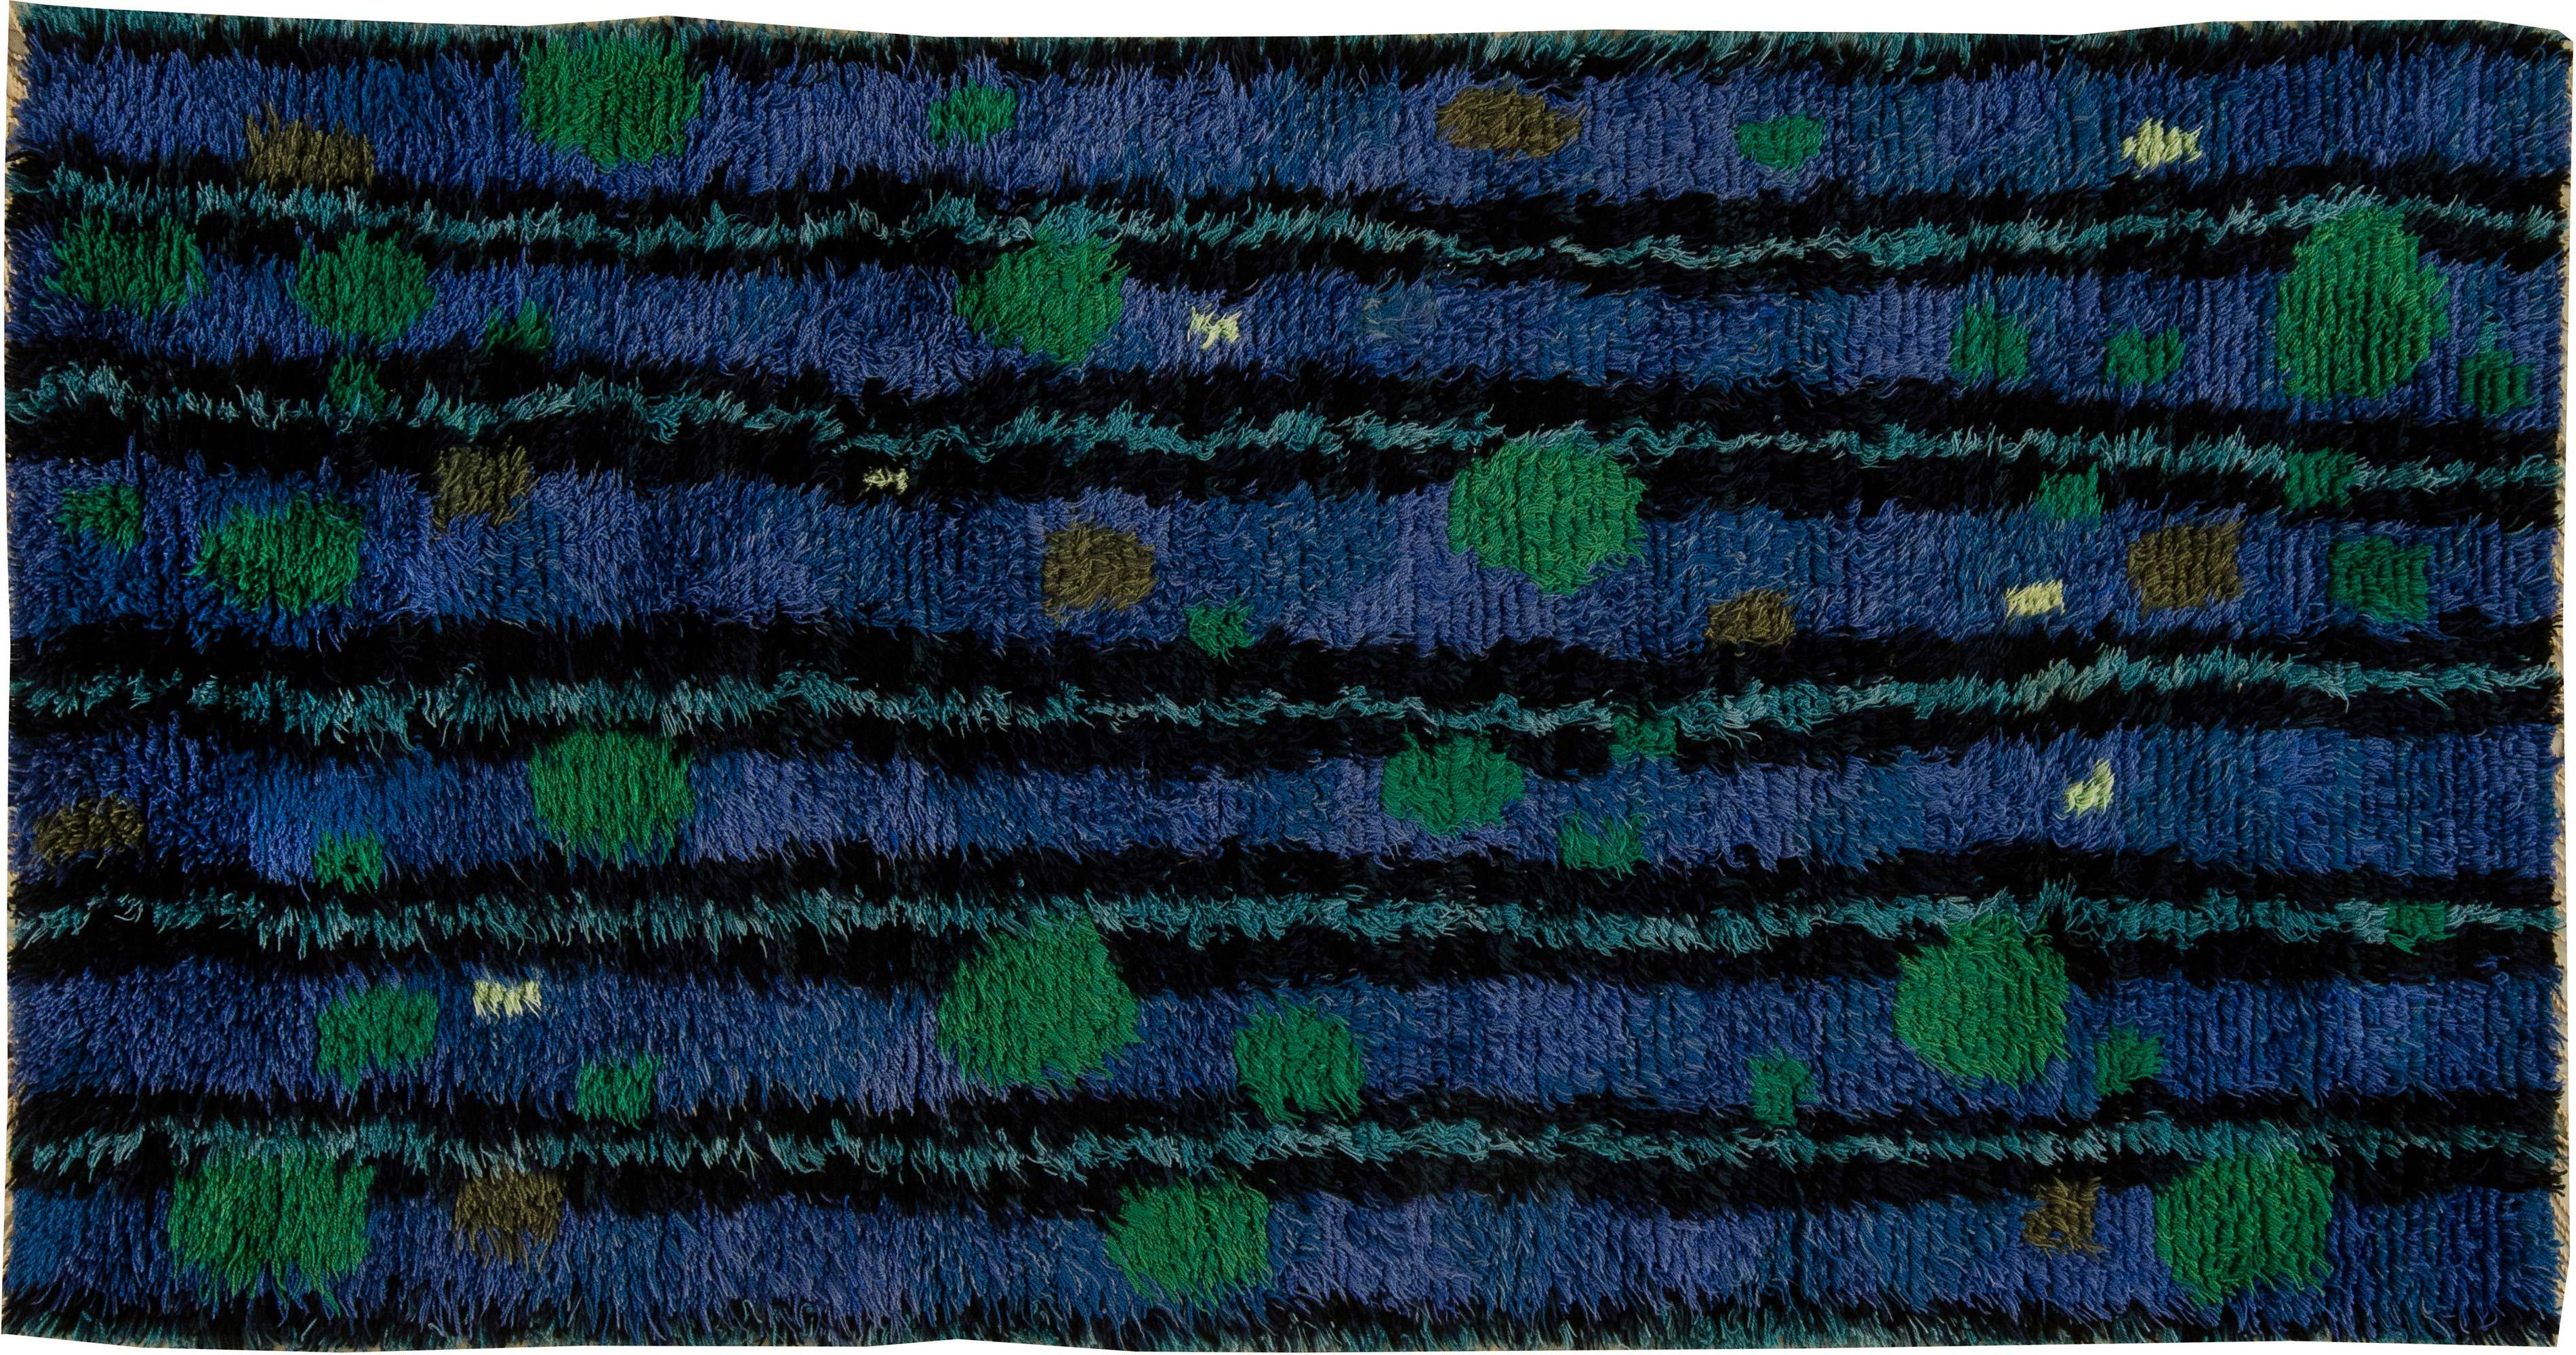 Mid Century Modern Swedish Rya Rug In Lapis Blue Emerald Green And Black Bb6396 By Dlb